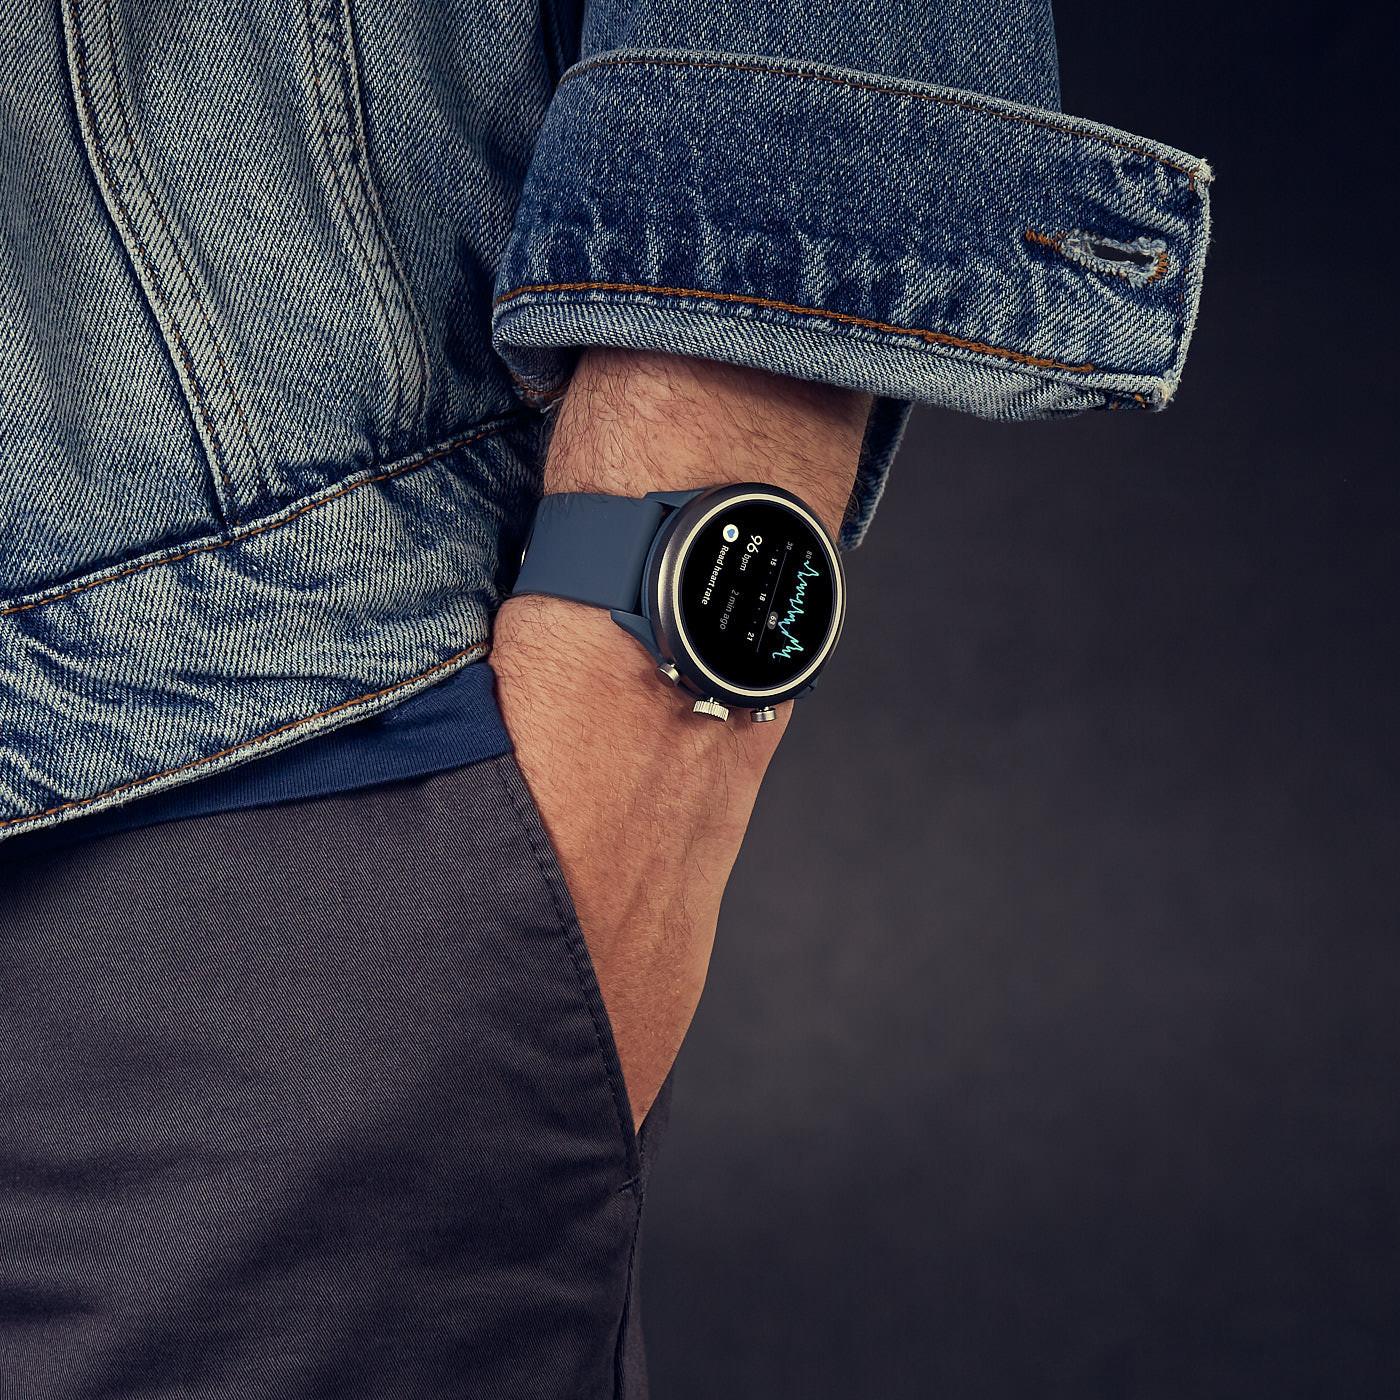 Fossil Sport Gen 4S Display Smartwatch FTW4021